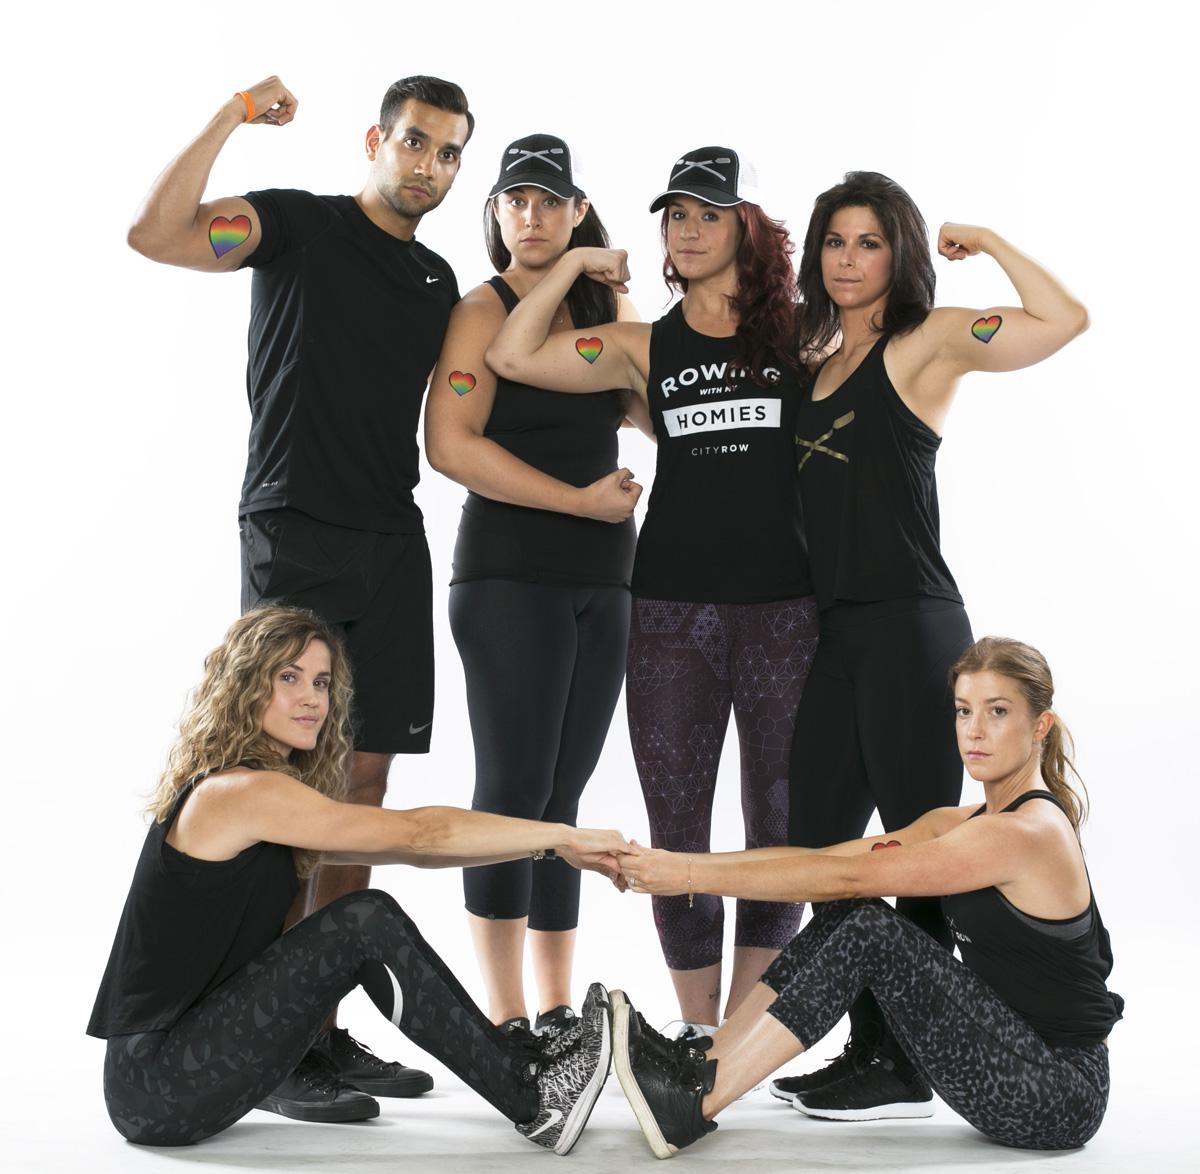 CityRow Team